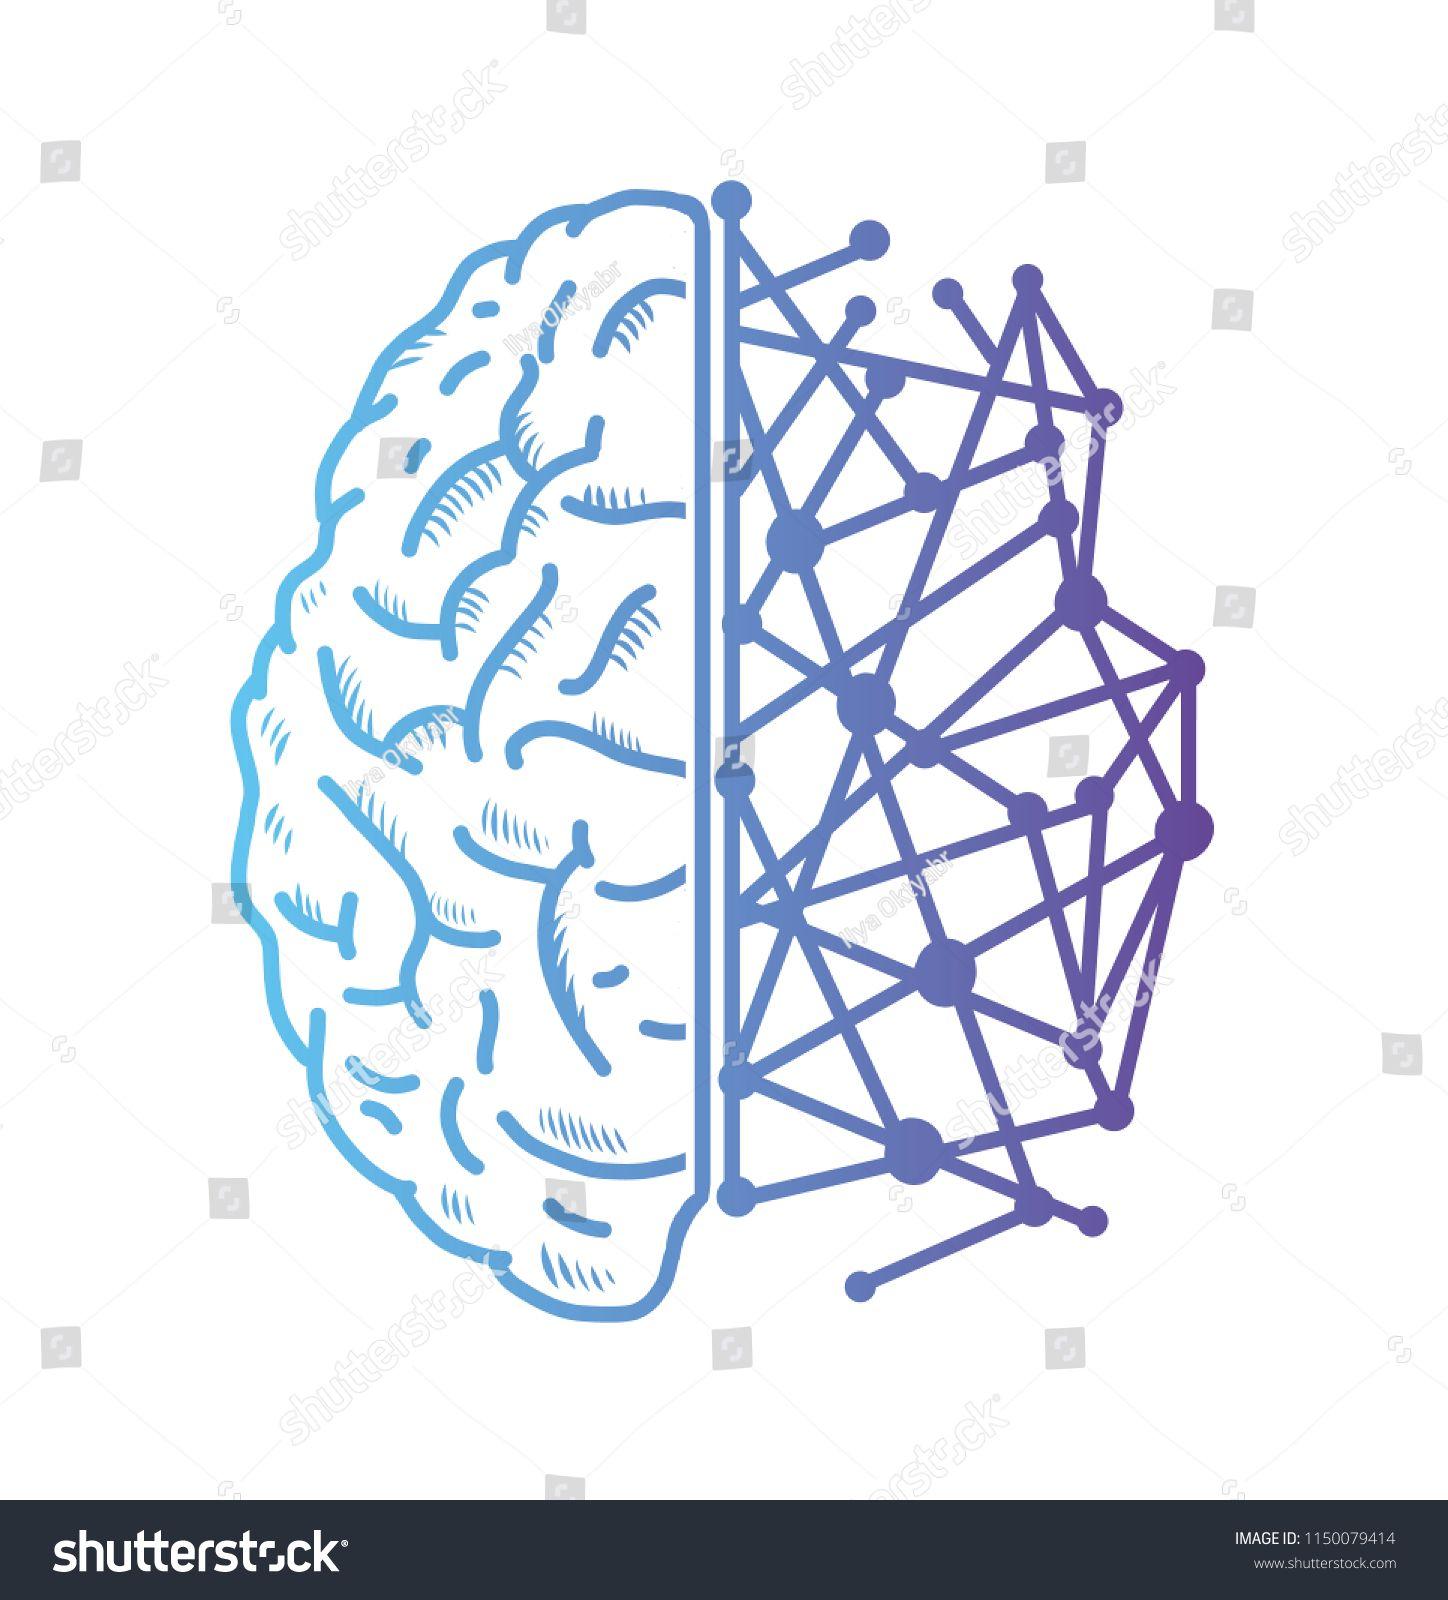 Artificial intelligence icon brain. Vector illustration